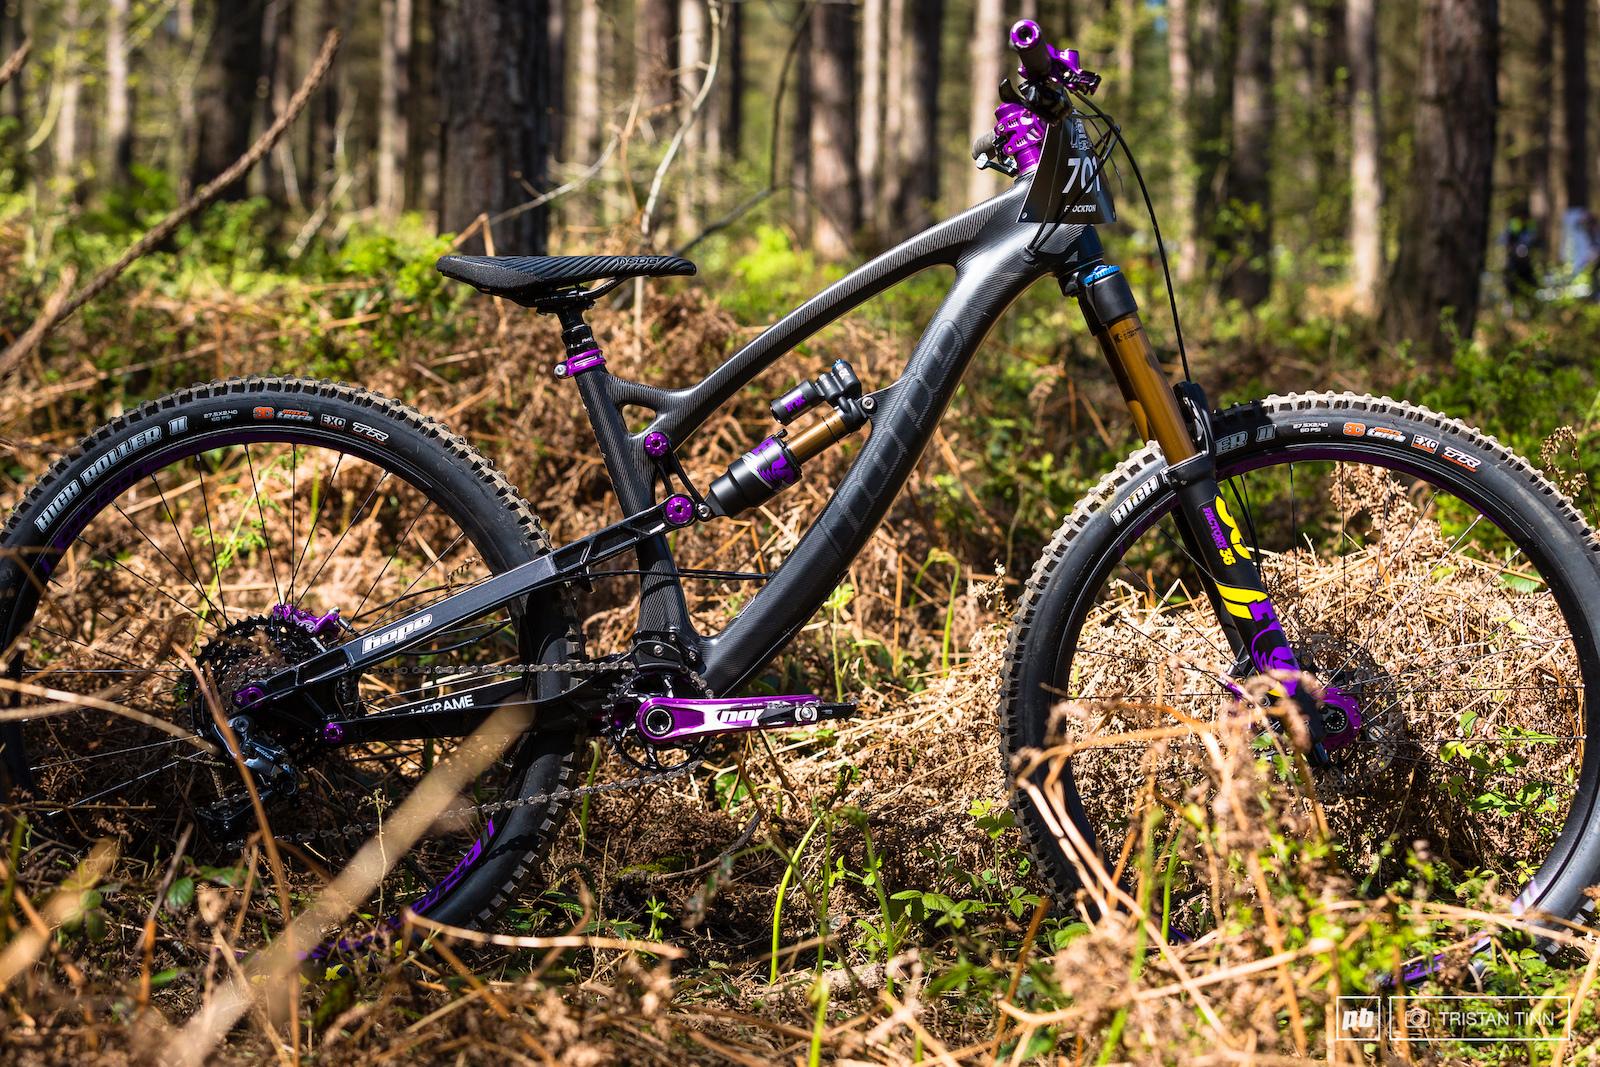 Emma Flockton s HB160 laced with purple